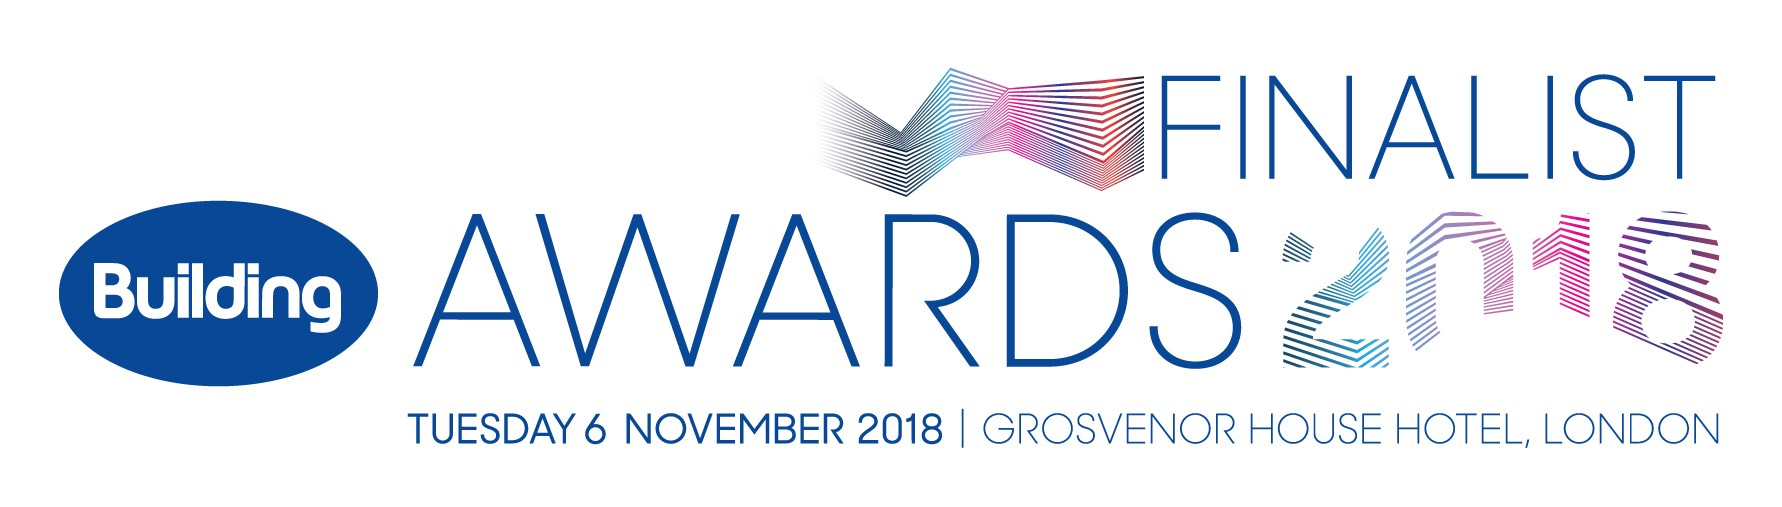 Building Awards 2018 Finalist